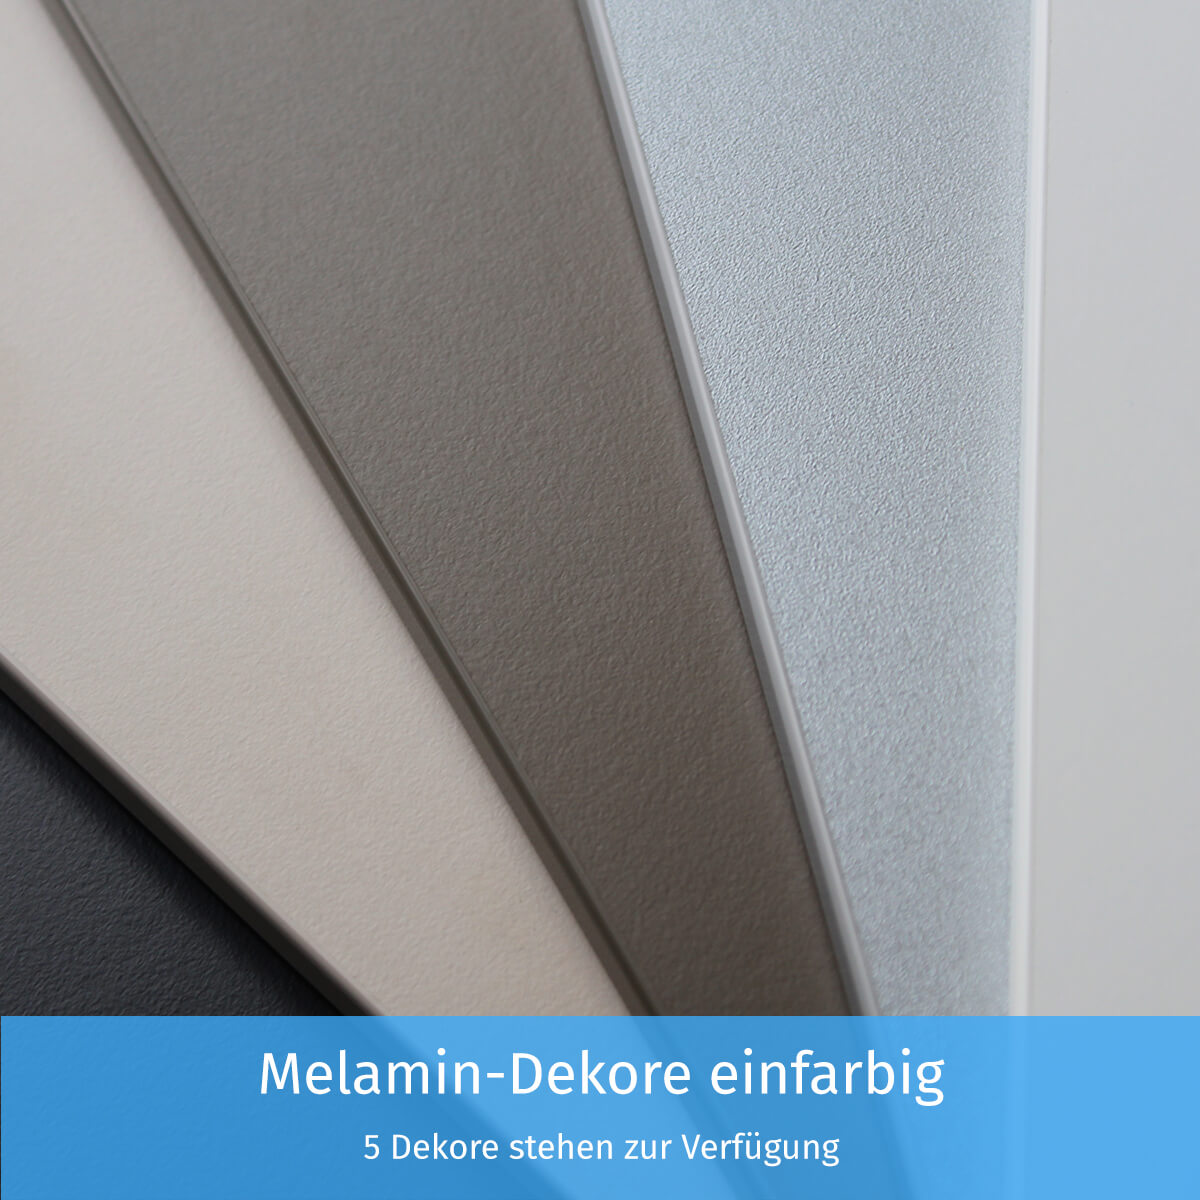 Melamin-Dekore einfarbig